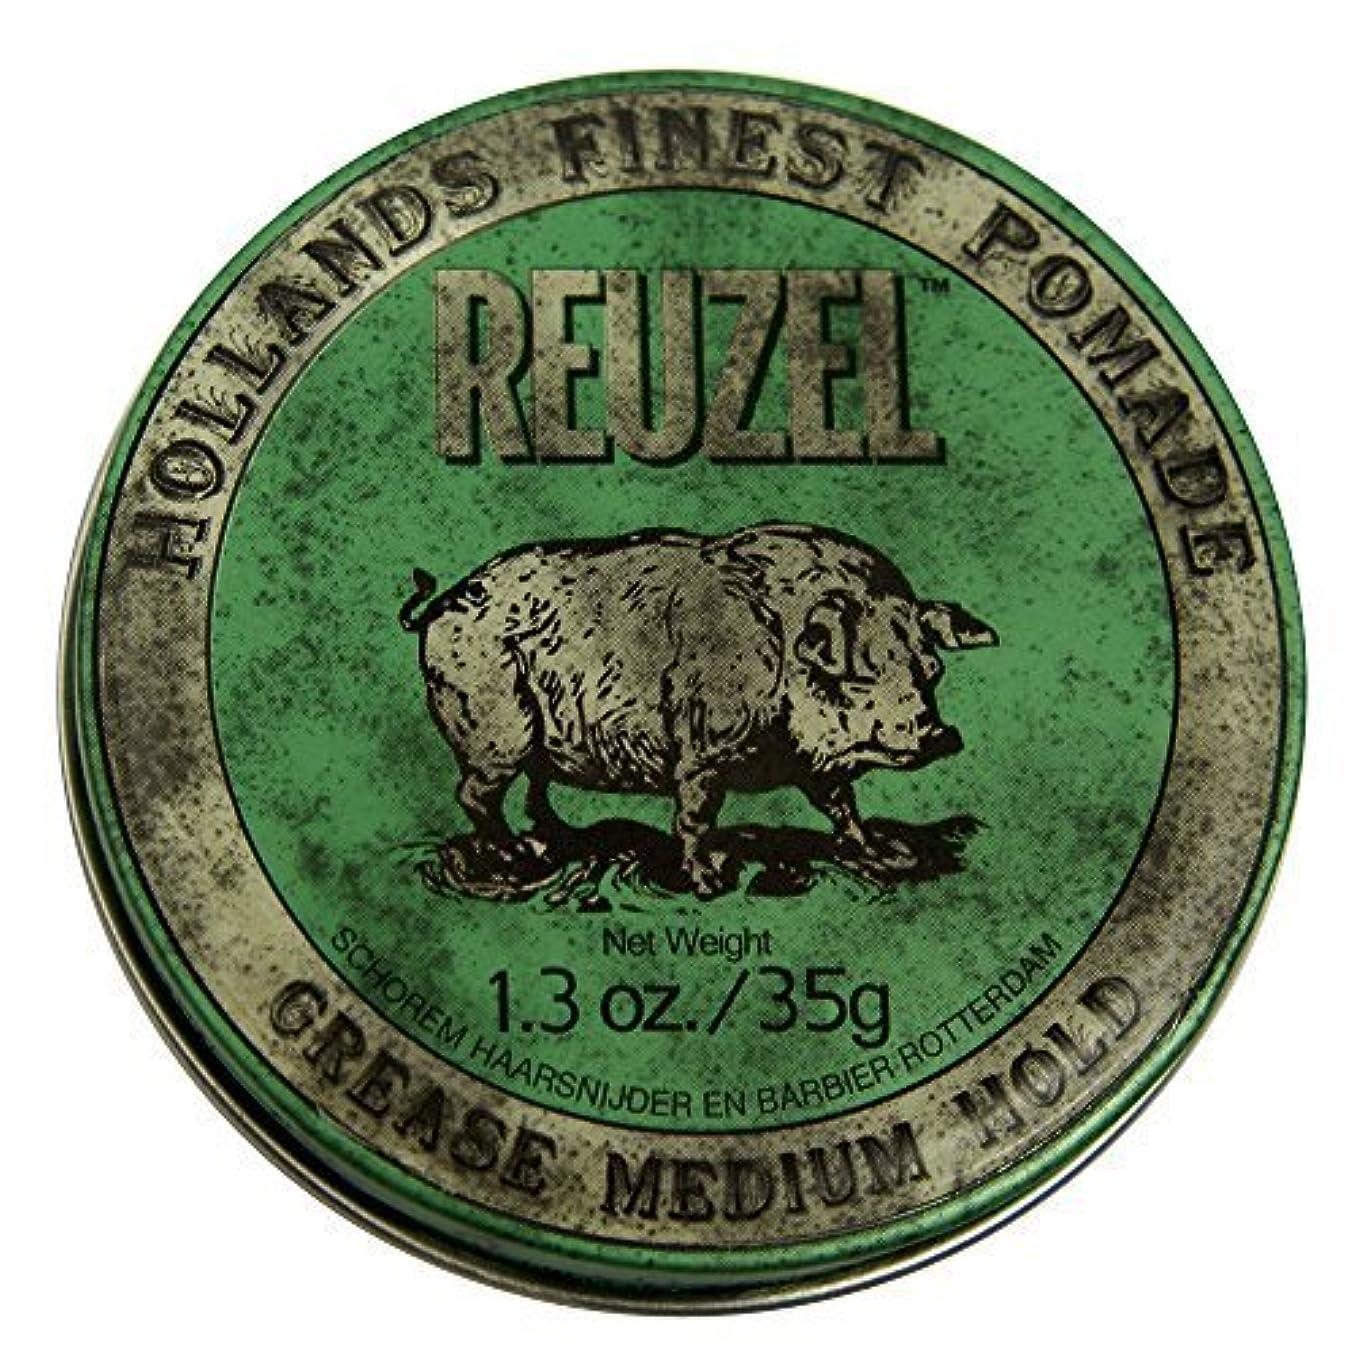 星責法律by Reuzel Reuzel Green Grease Medium Hold Hair Styling Pomade Piglet 1.3oz (35g) Wax/Gel [並行輸入品]